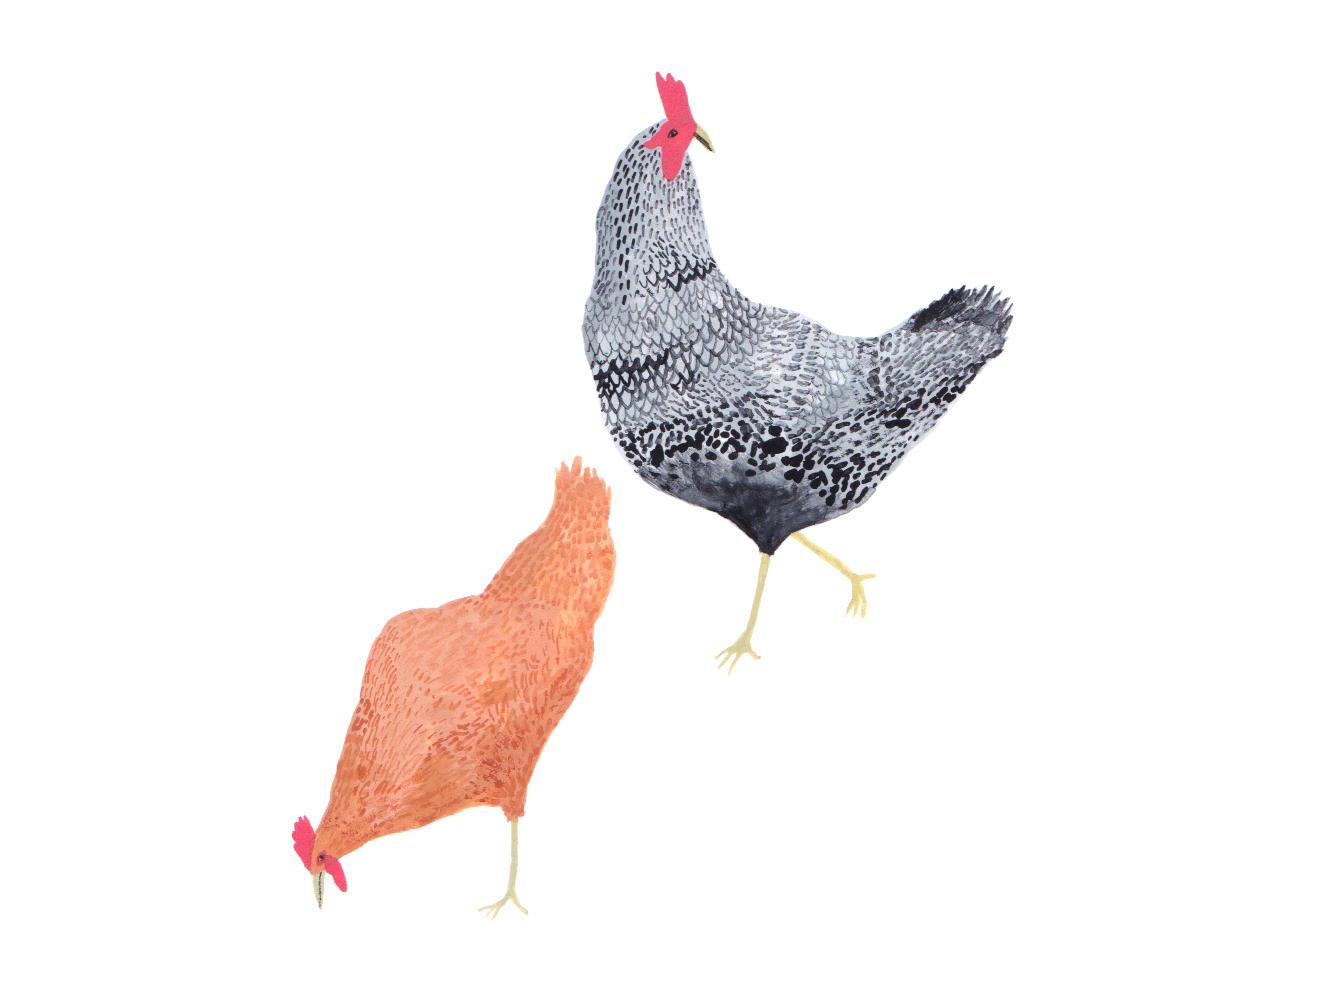 Copy of Silvopasture chickens.jpg